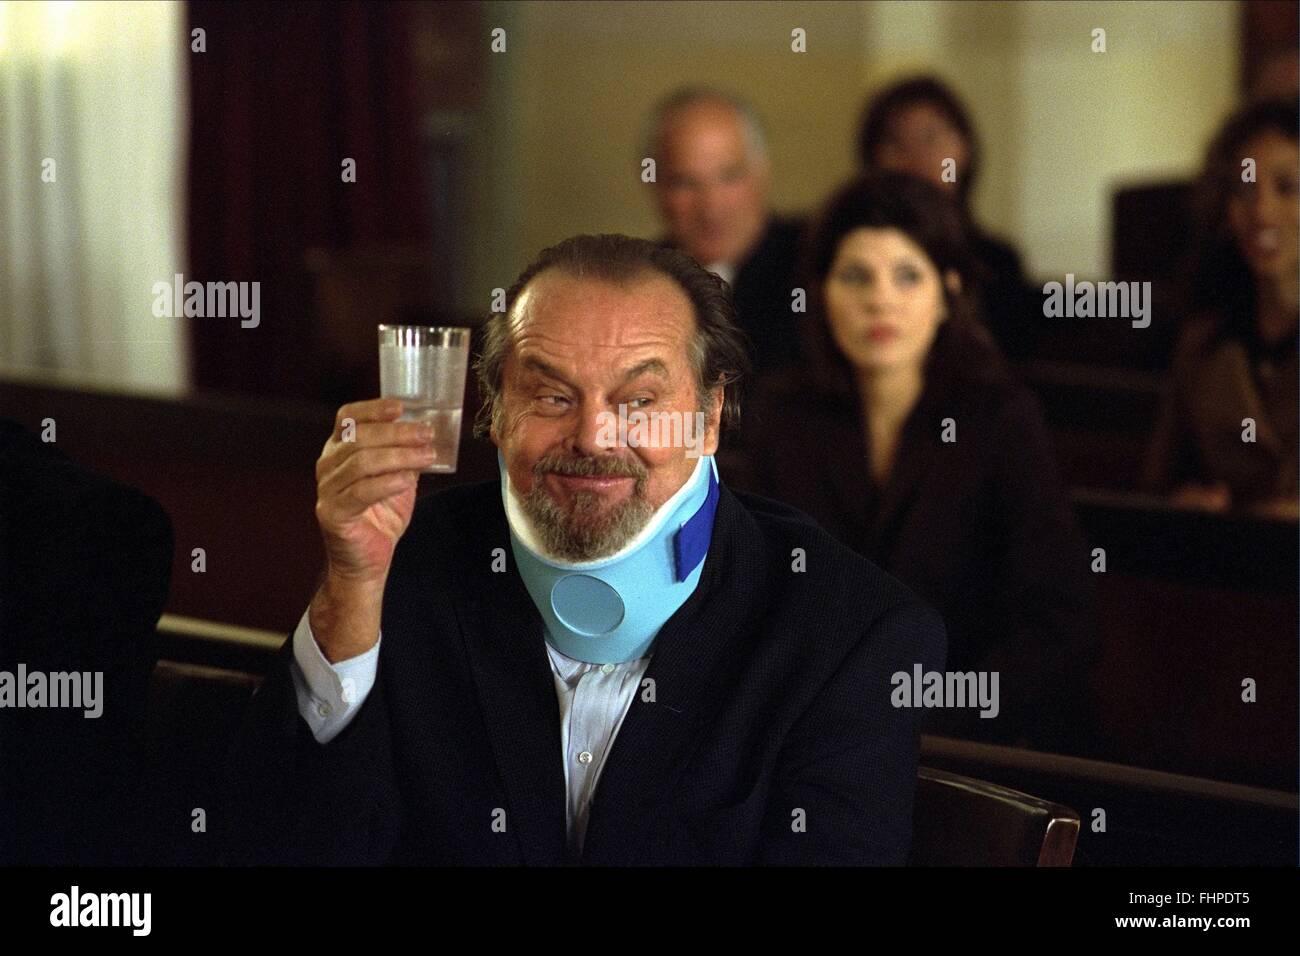 Jack Nicholson Anger Management 2003 Stock Photo Alamy